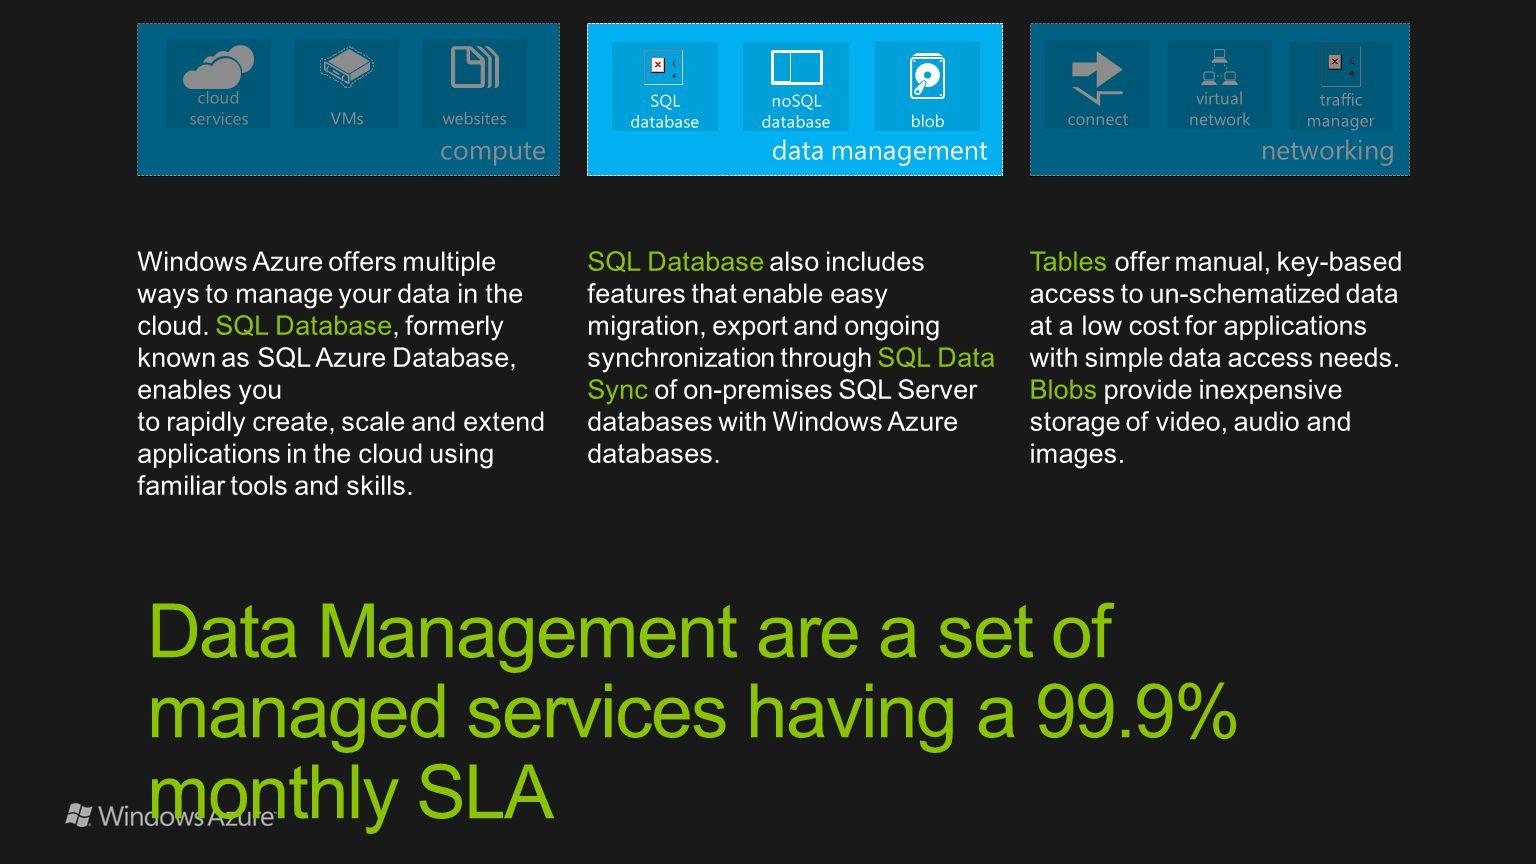 computedata managementnetworking SQL database noSQL database blob connect virtual network traffic manager cloud servicesVMs websites Windows Azure off